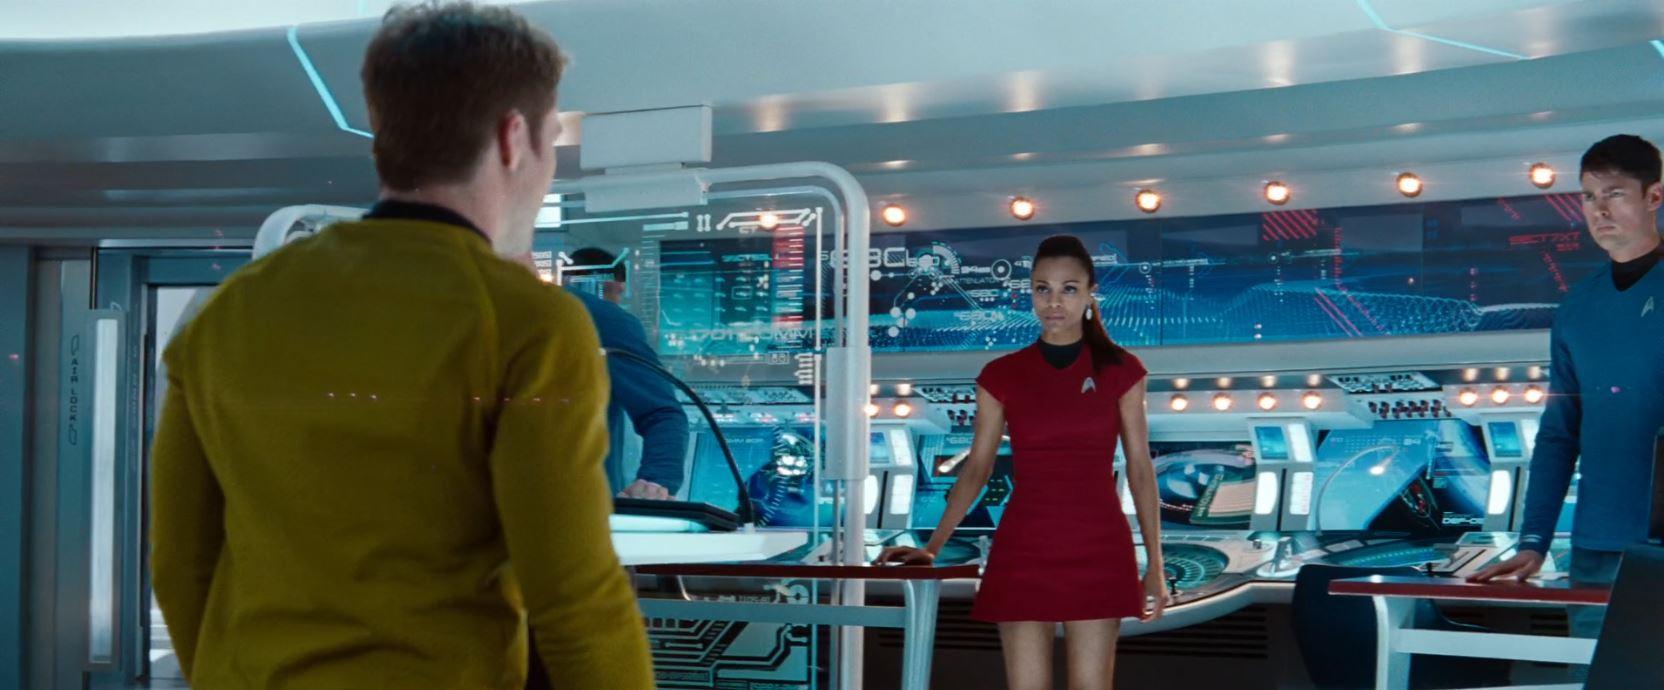 New Star Trek TV series - Zoe Saldana in skirt uniform